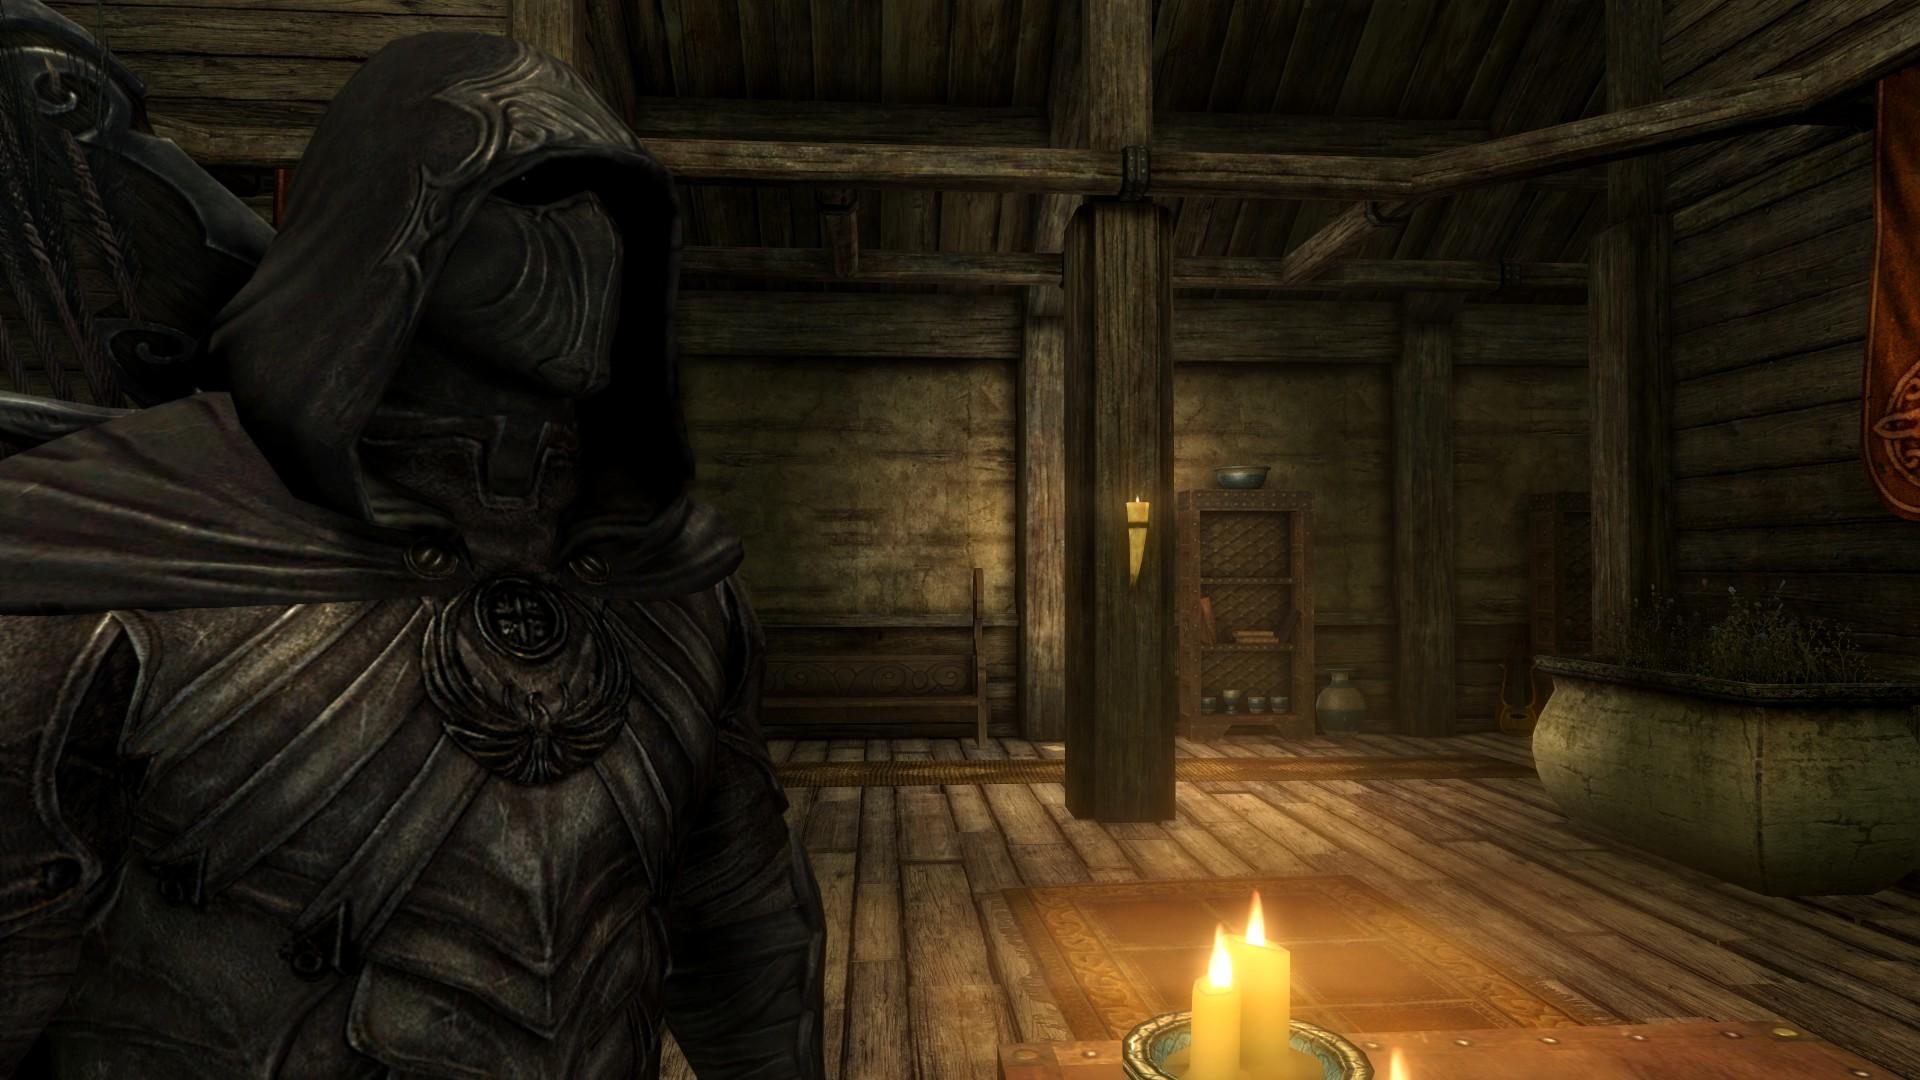 20180616172804_1.jpg - Elder Scrolls 5: Skyrim, the